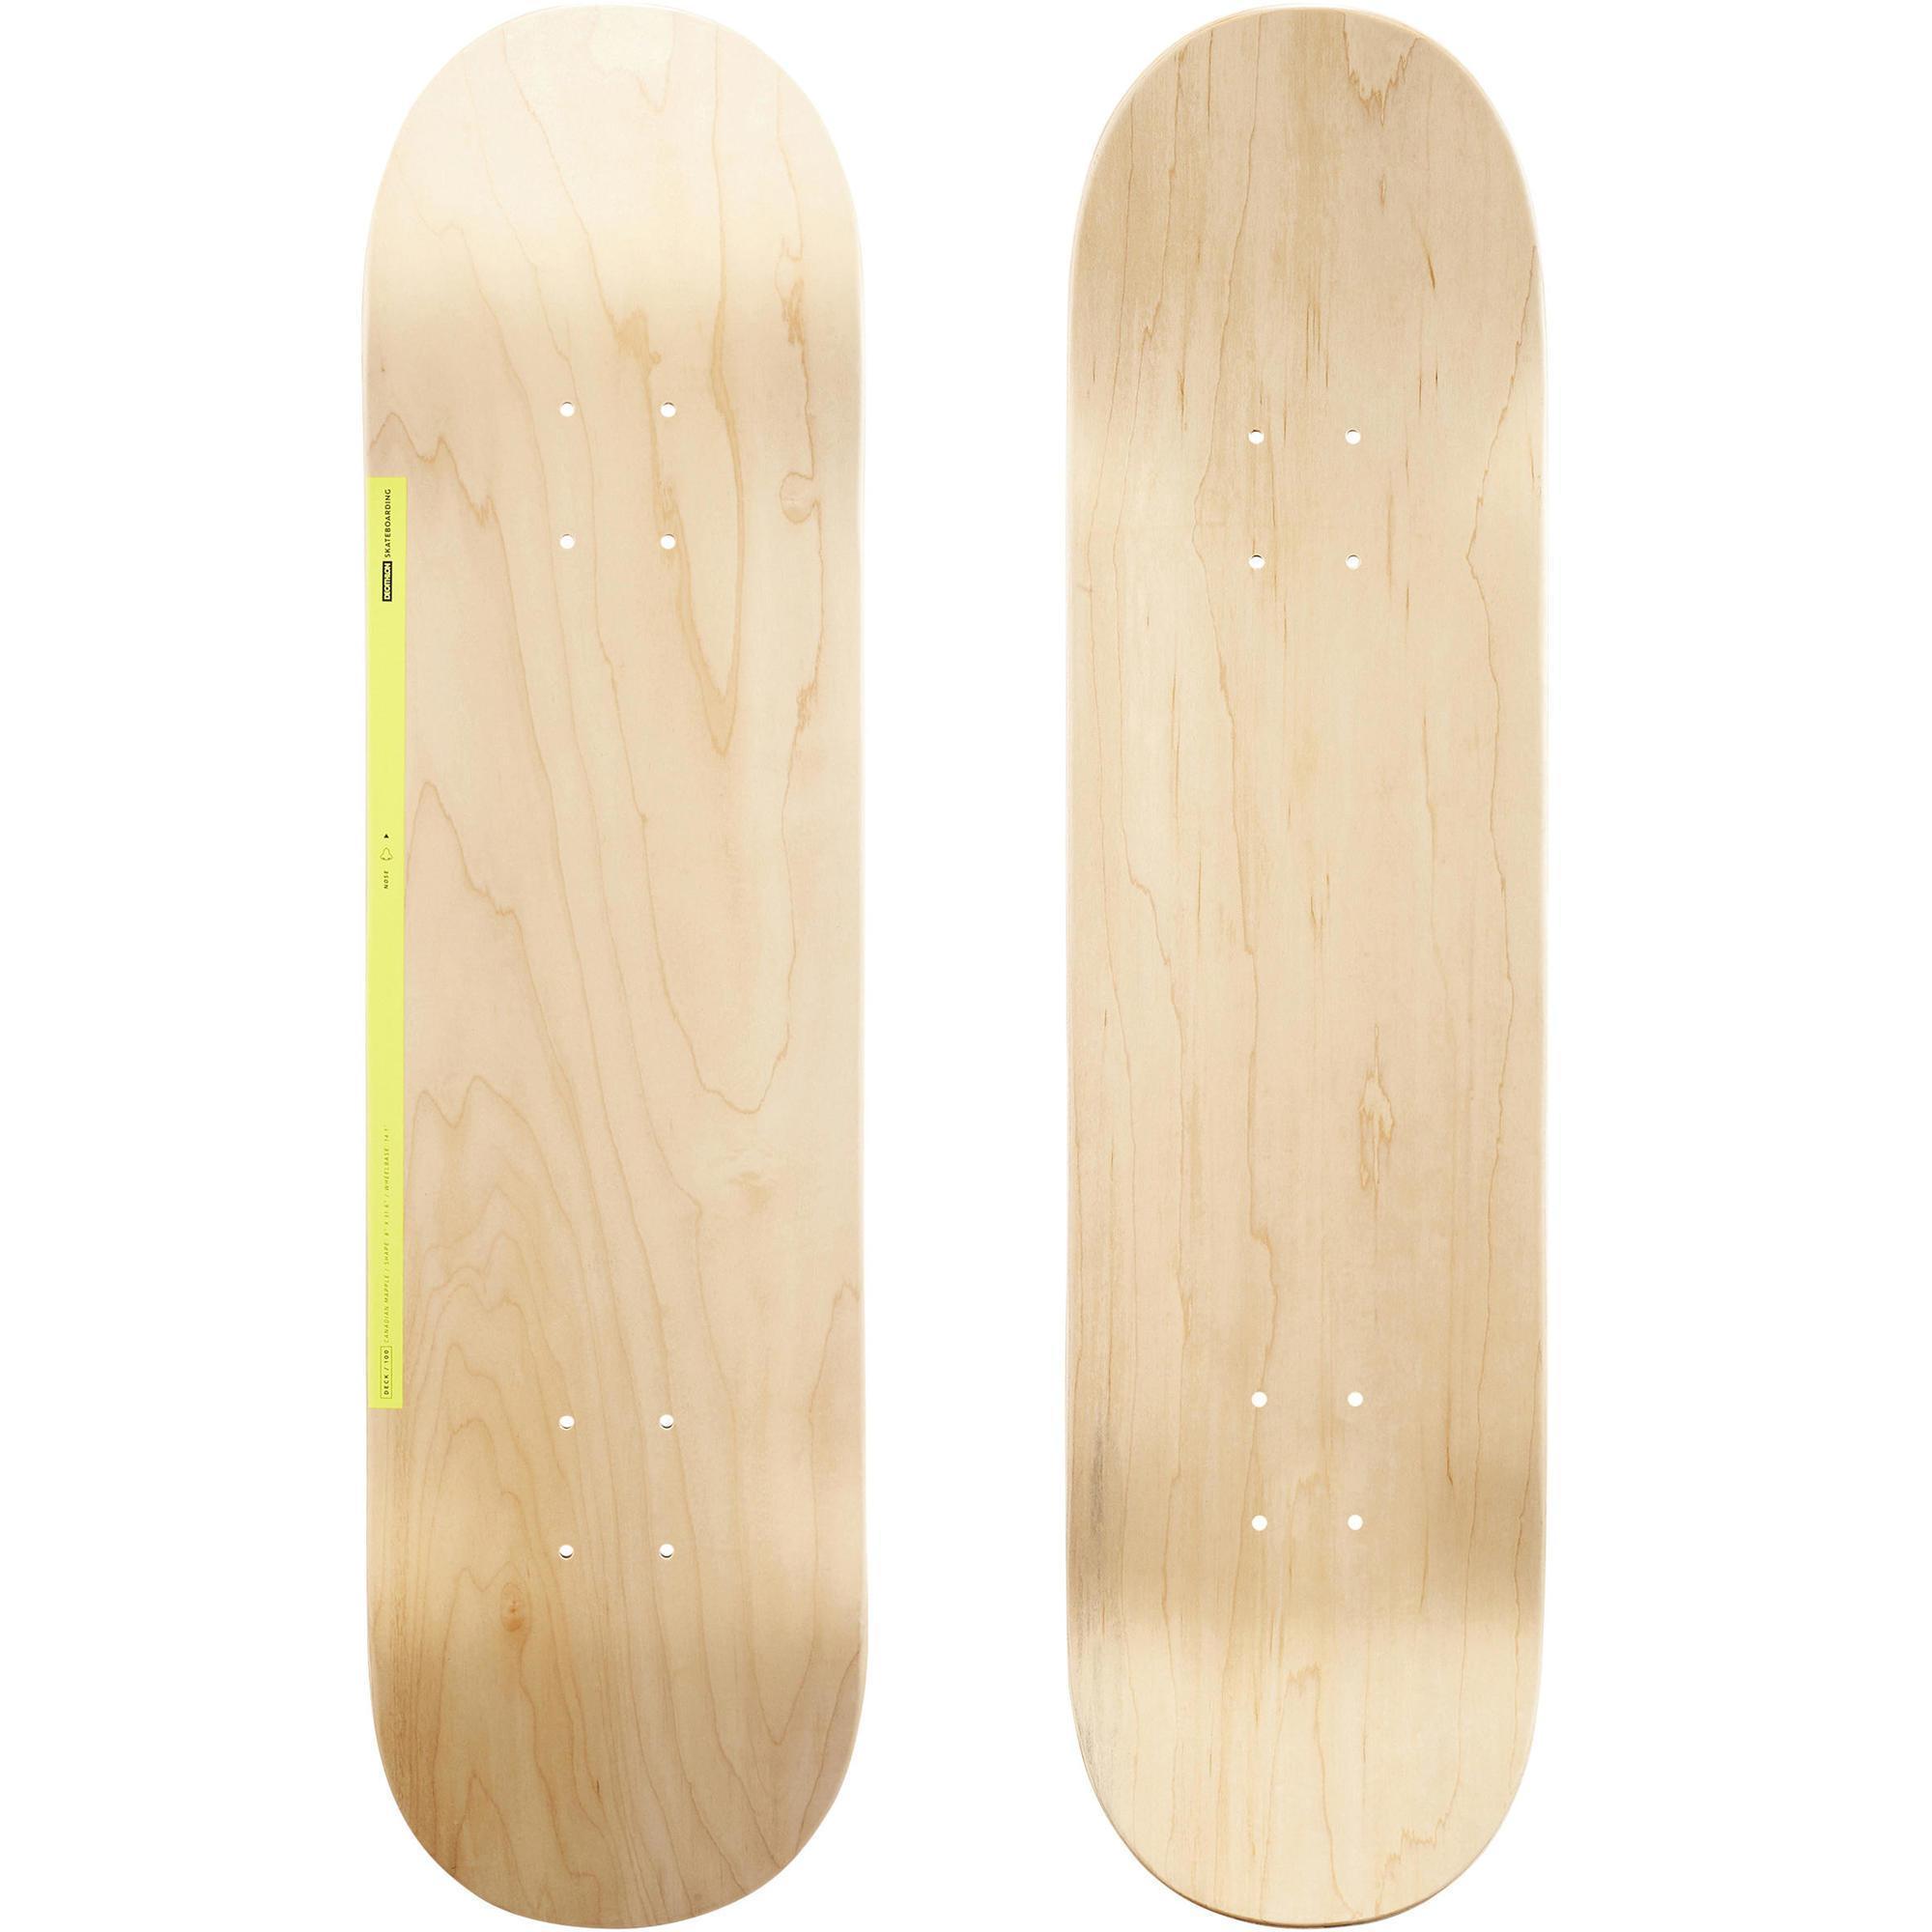 Comprar Tablas de Skate online  8db6a12aee7